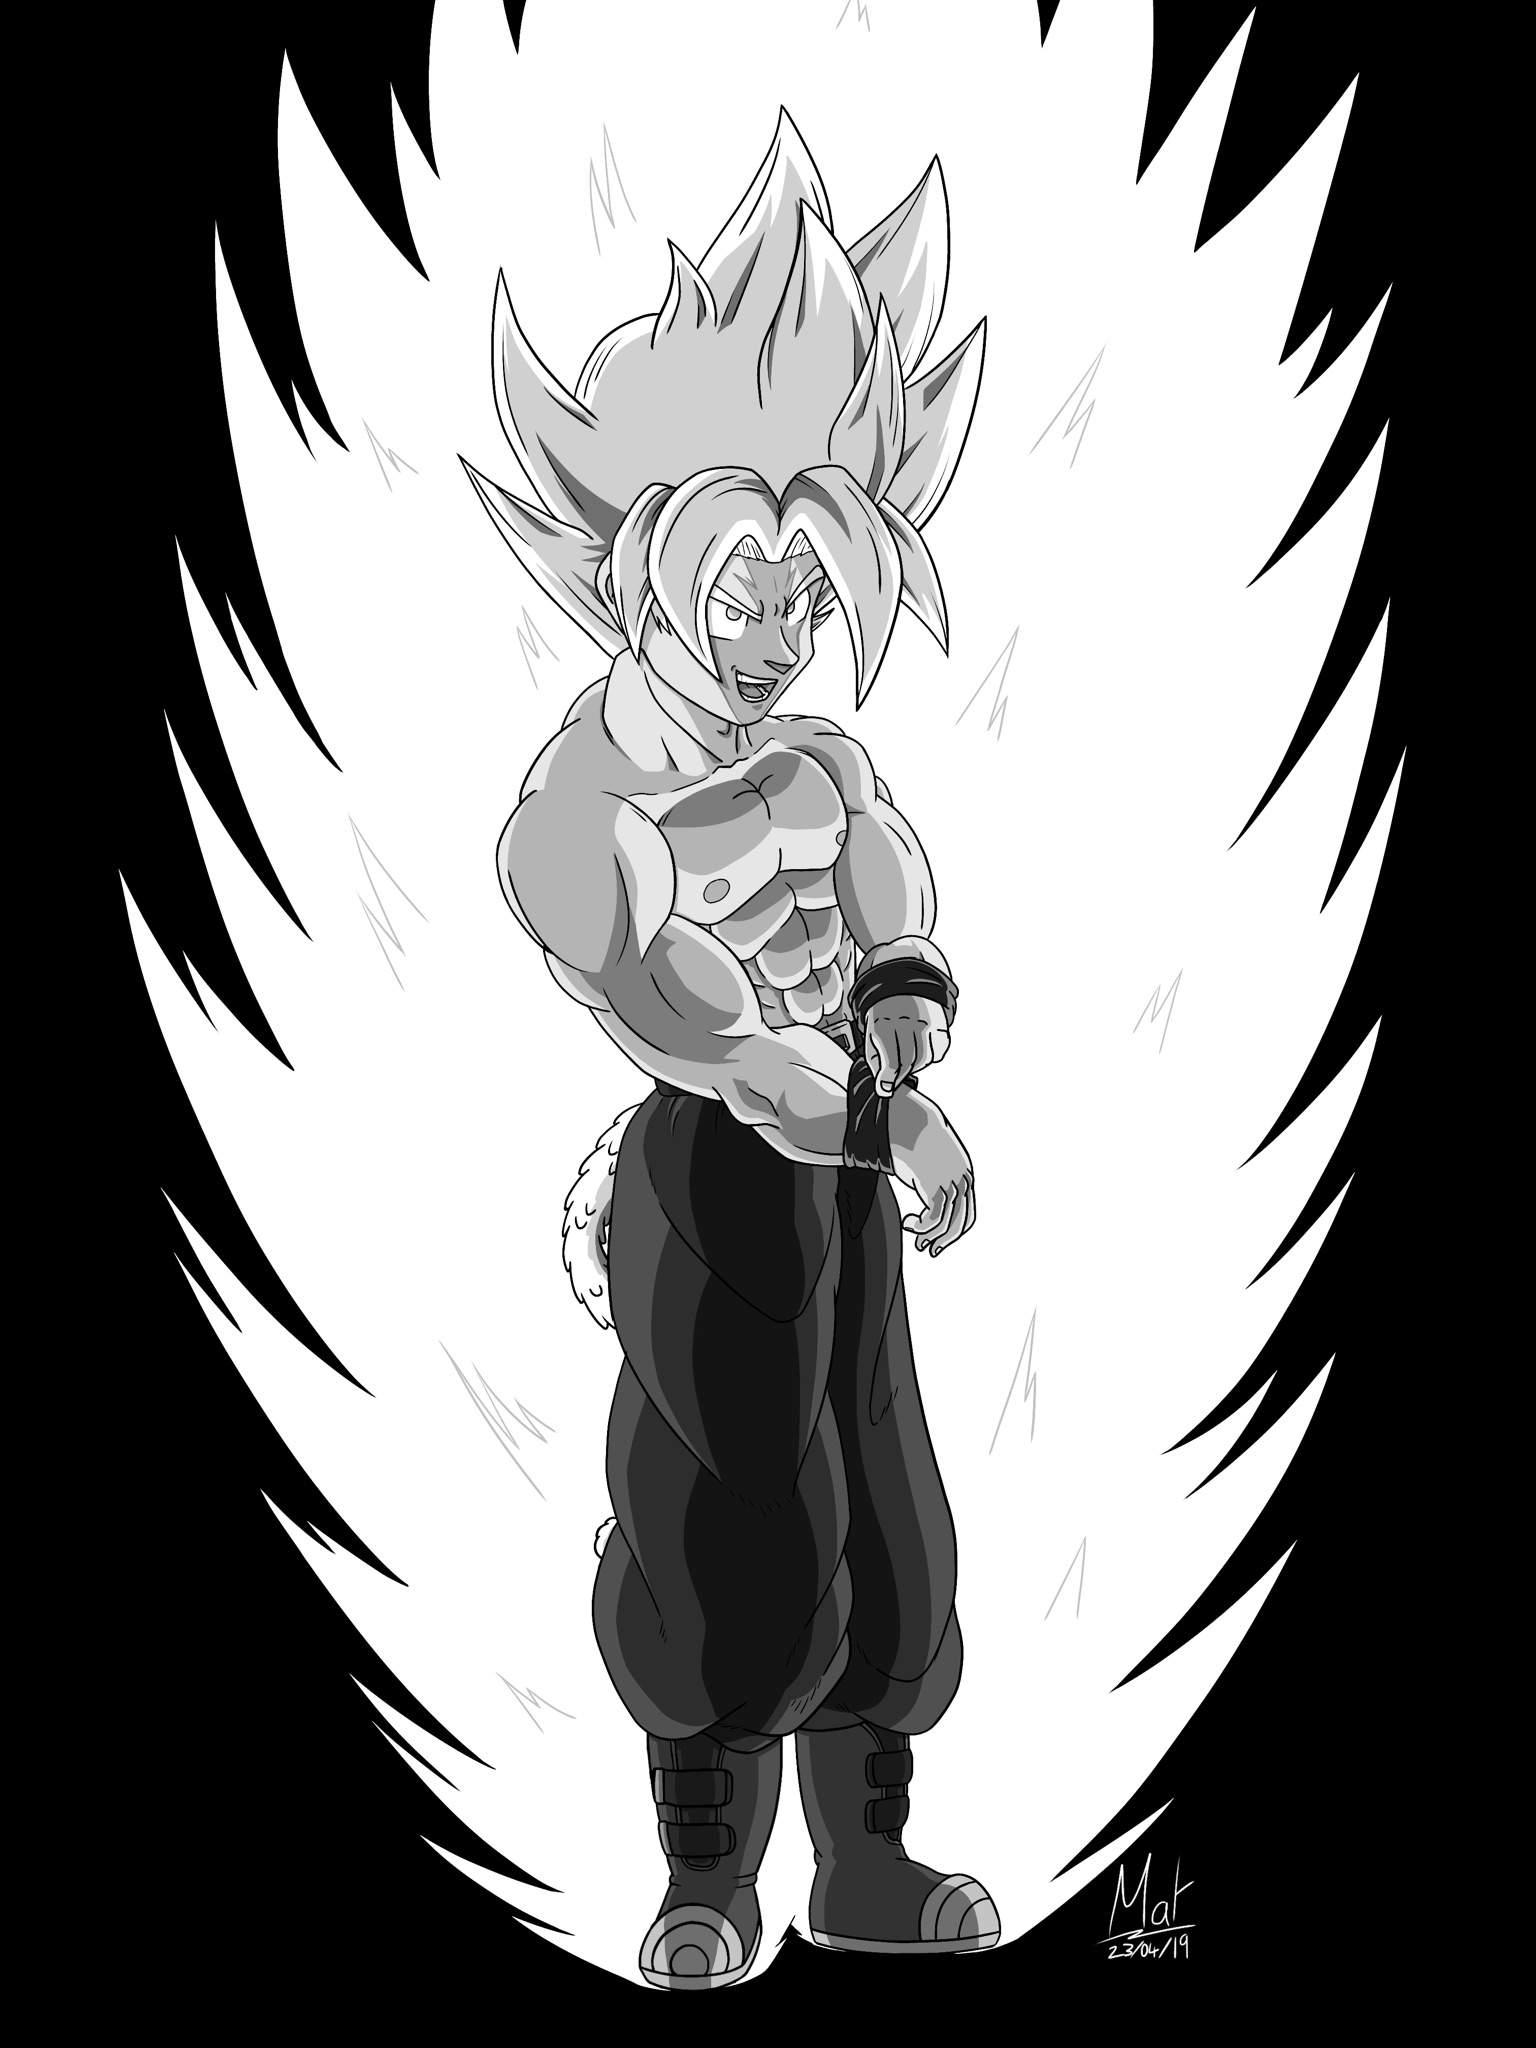 Super Saiyan Matkku Greyscale Art Dragonballz Amino